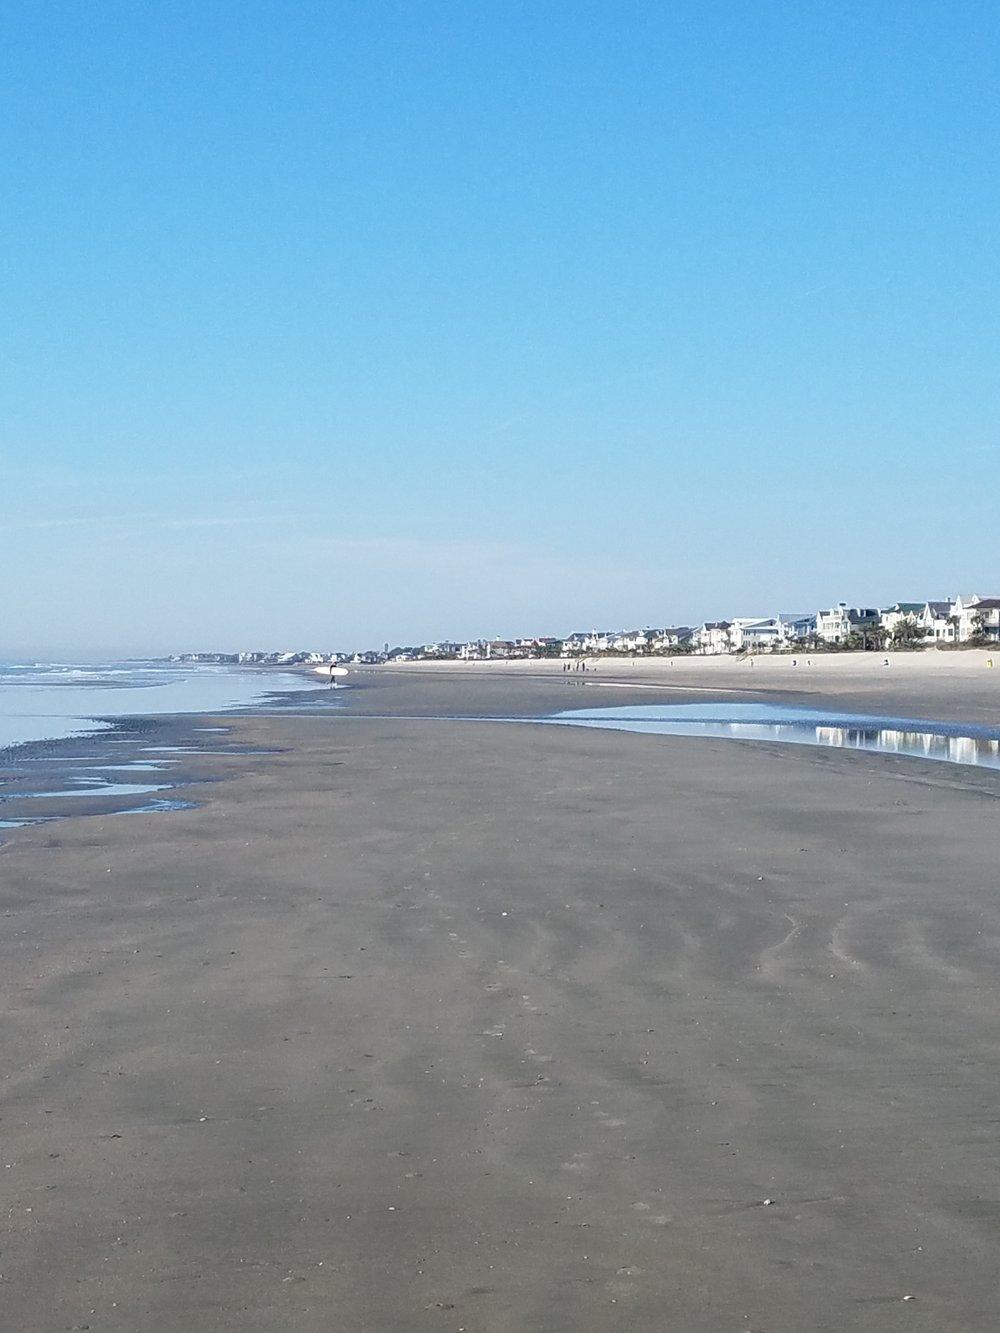 Low tide on Sullivans Island